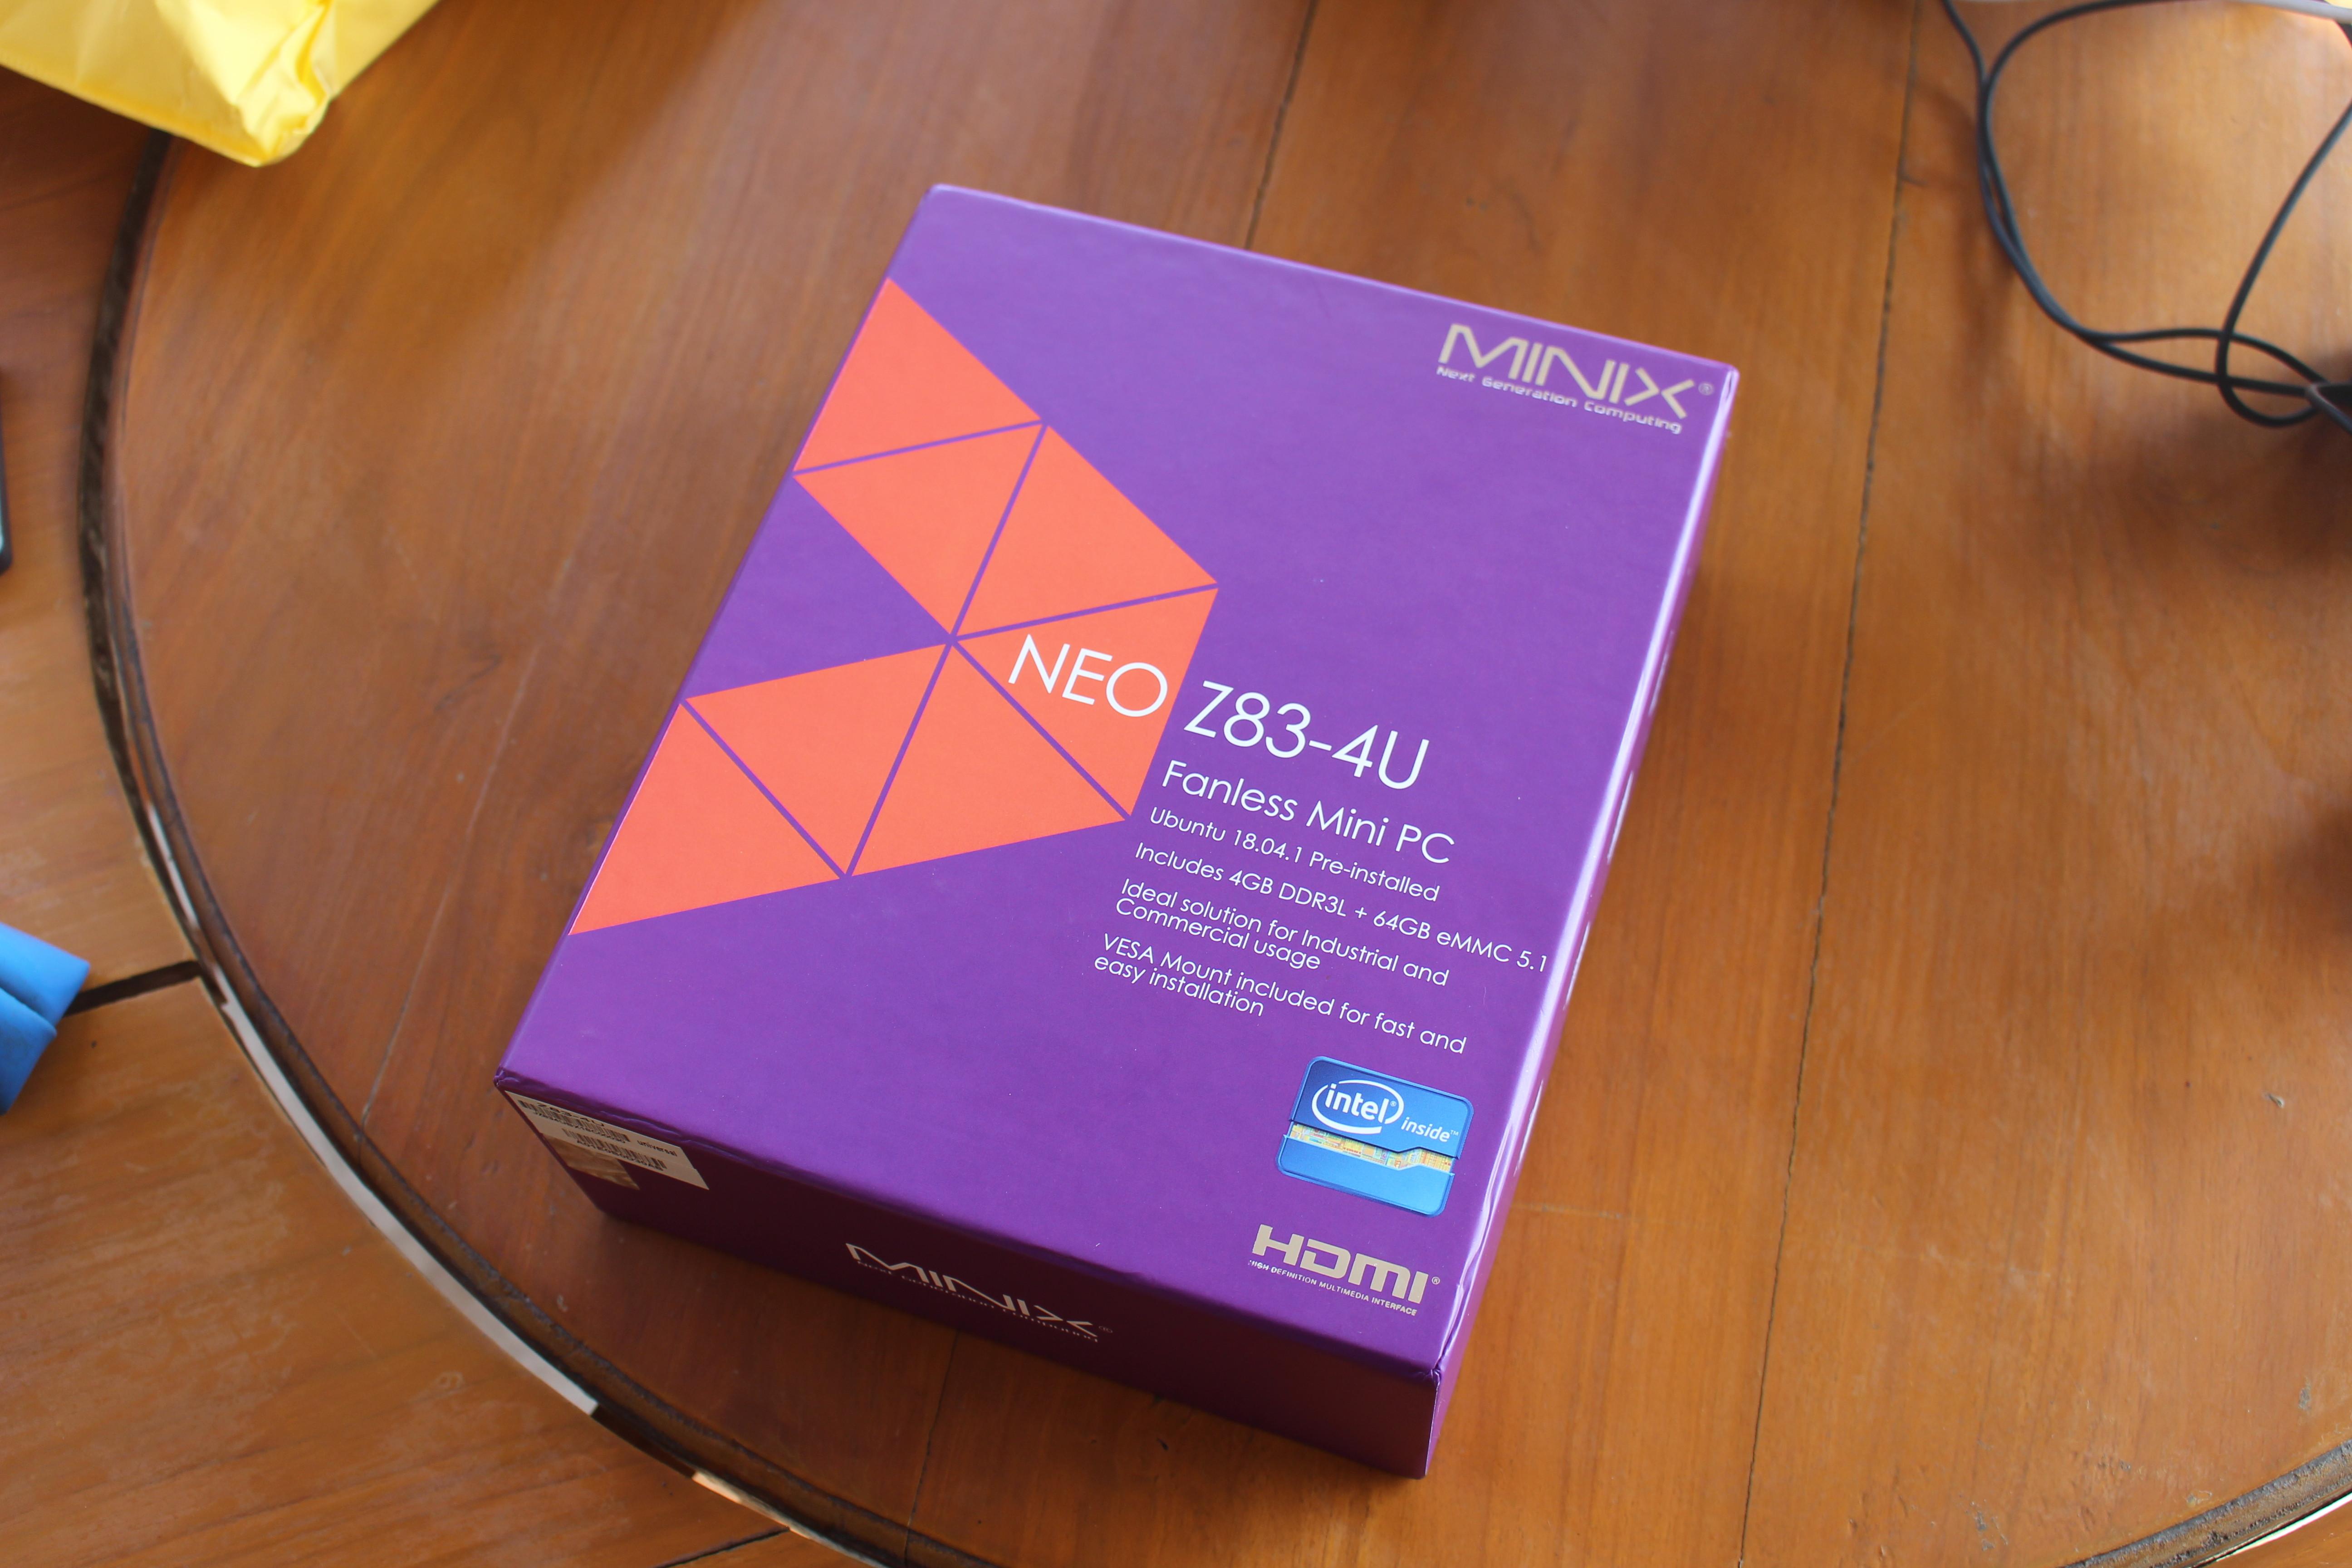 MINIX NEO Z83-4U Review - Part 1: Unboxing and Teardown